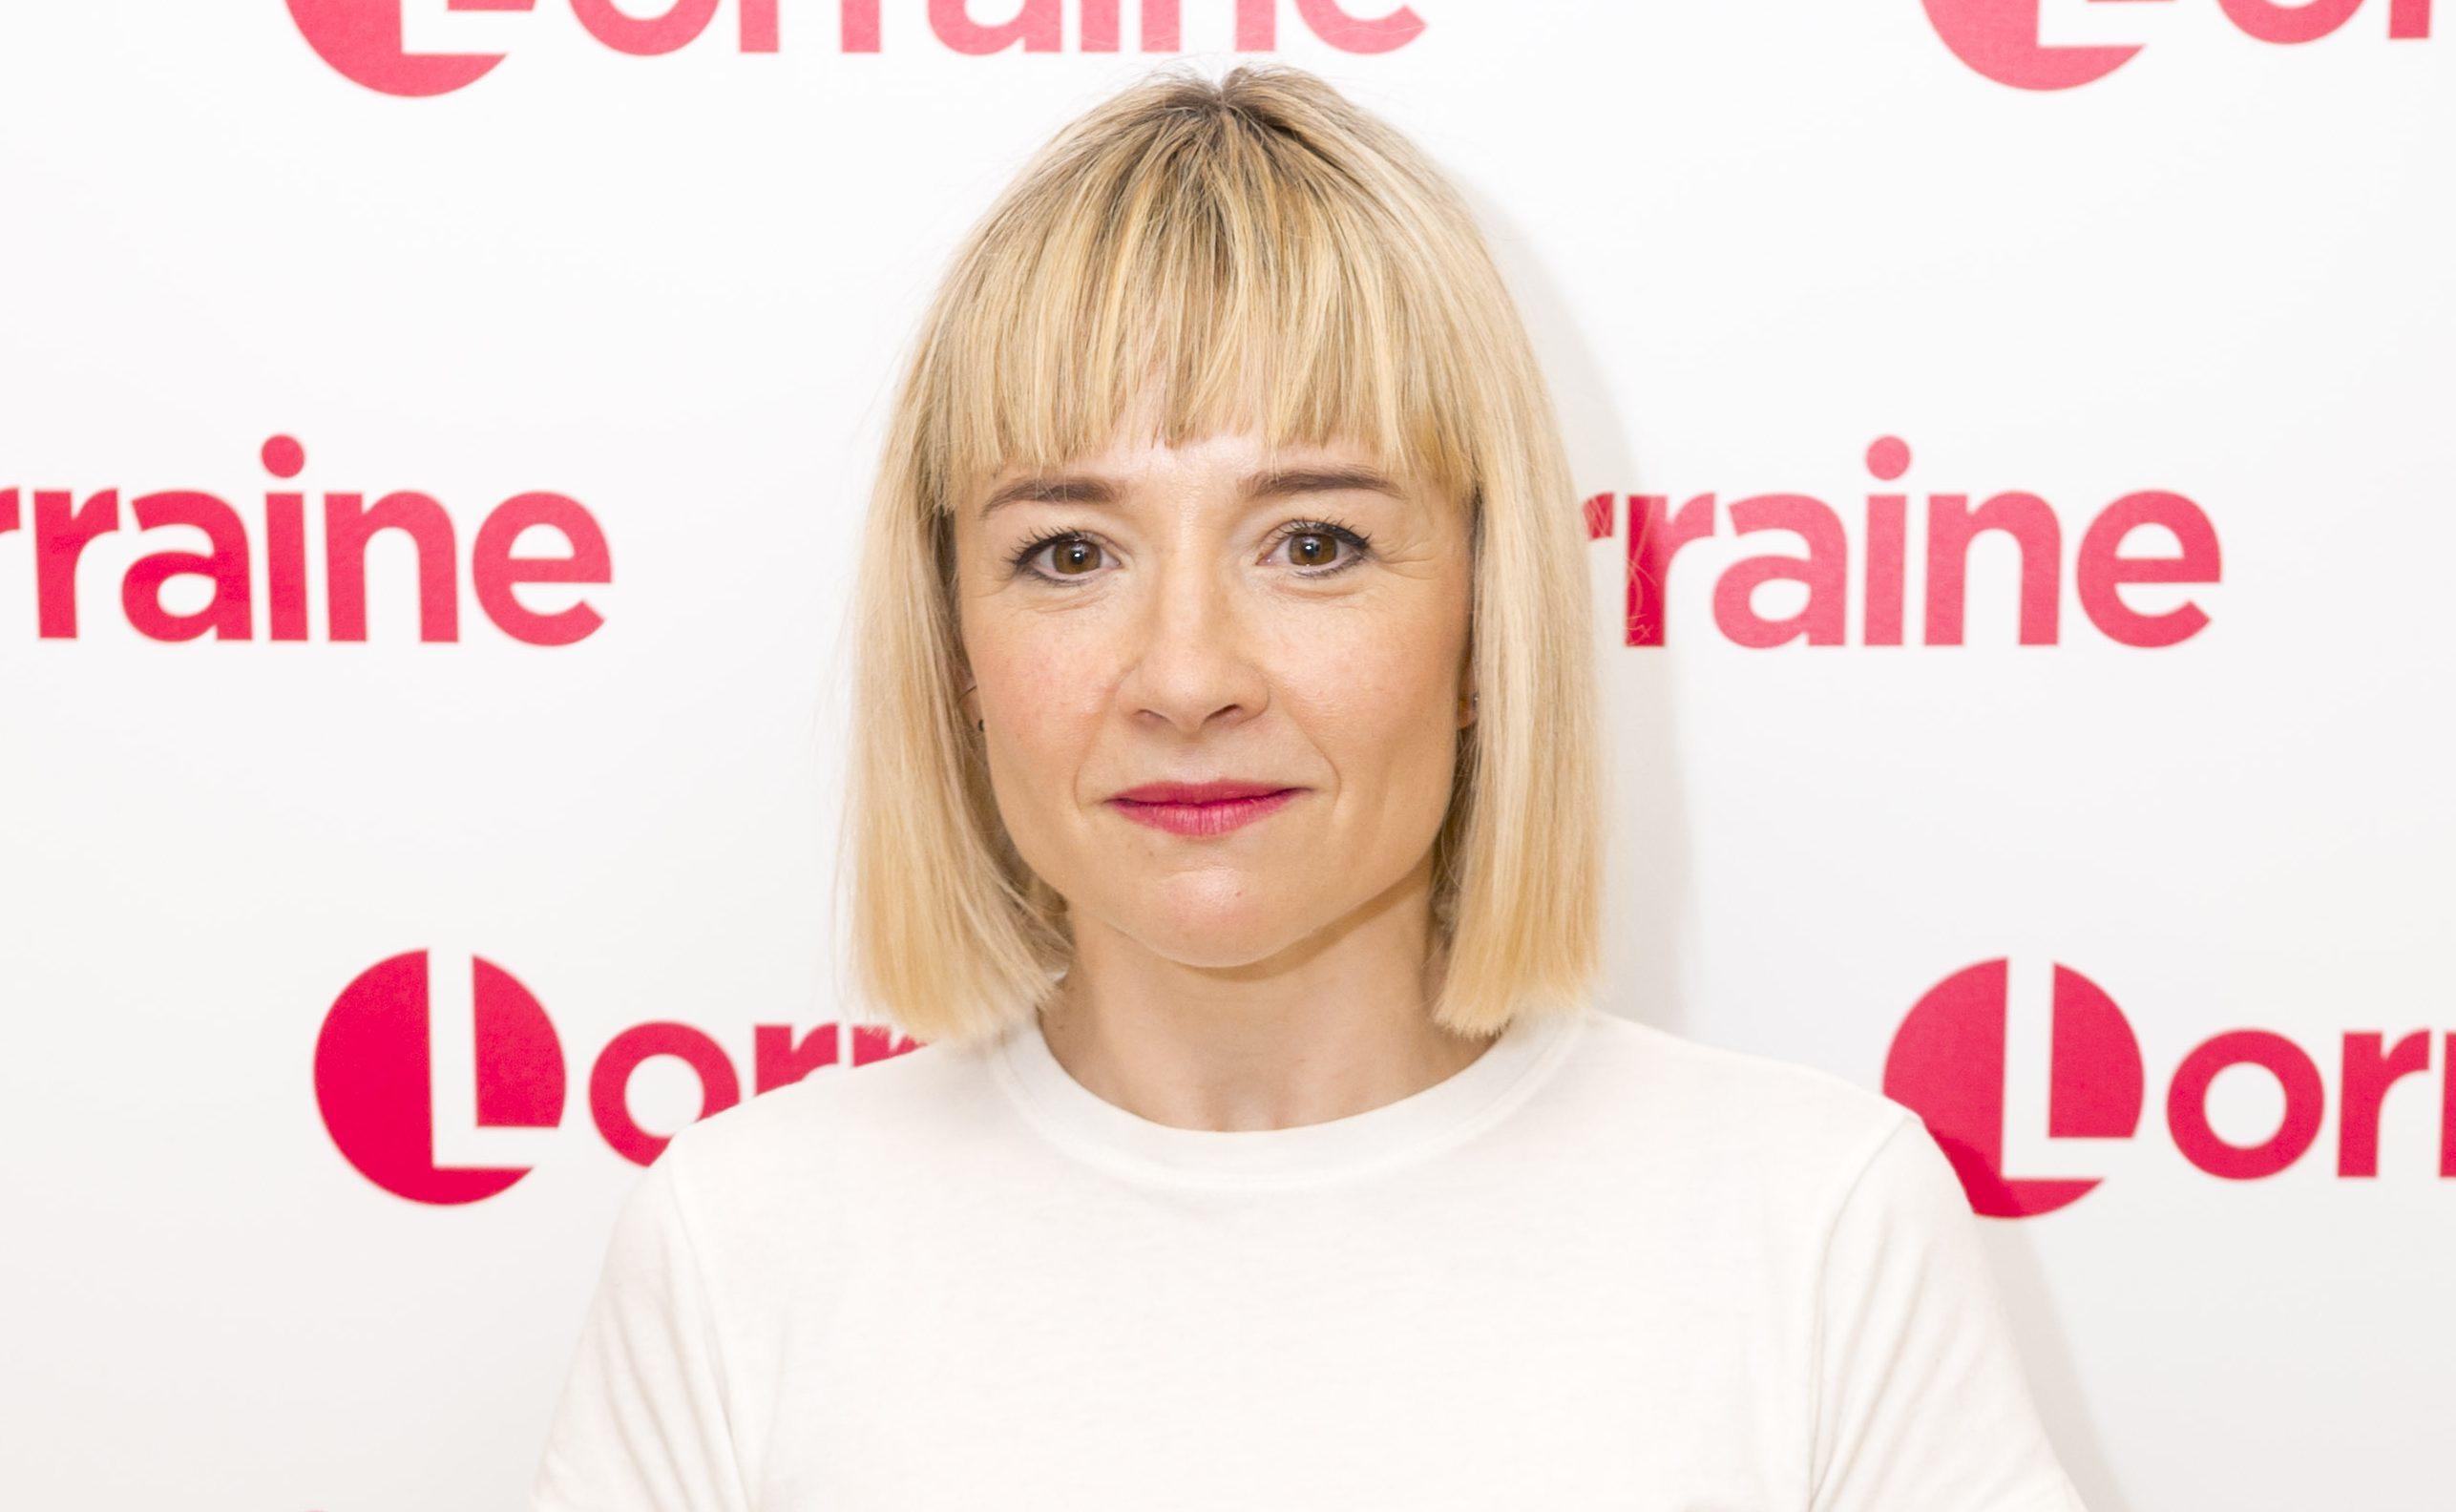 Rebecca Callard (Ken McKay/ITV/REX/Shutterstock)